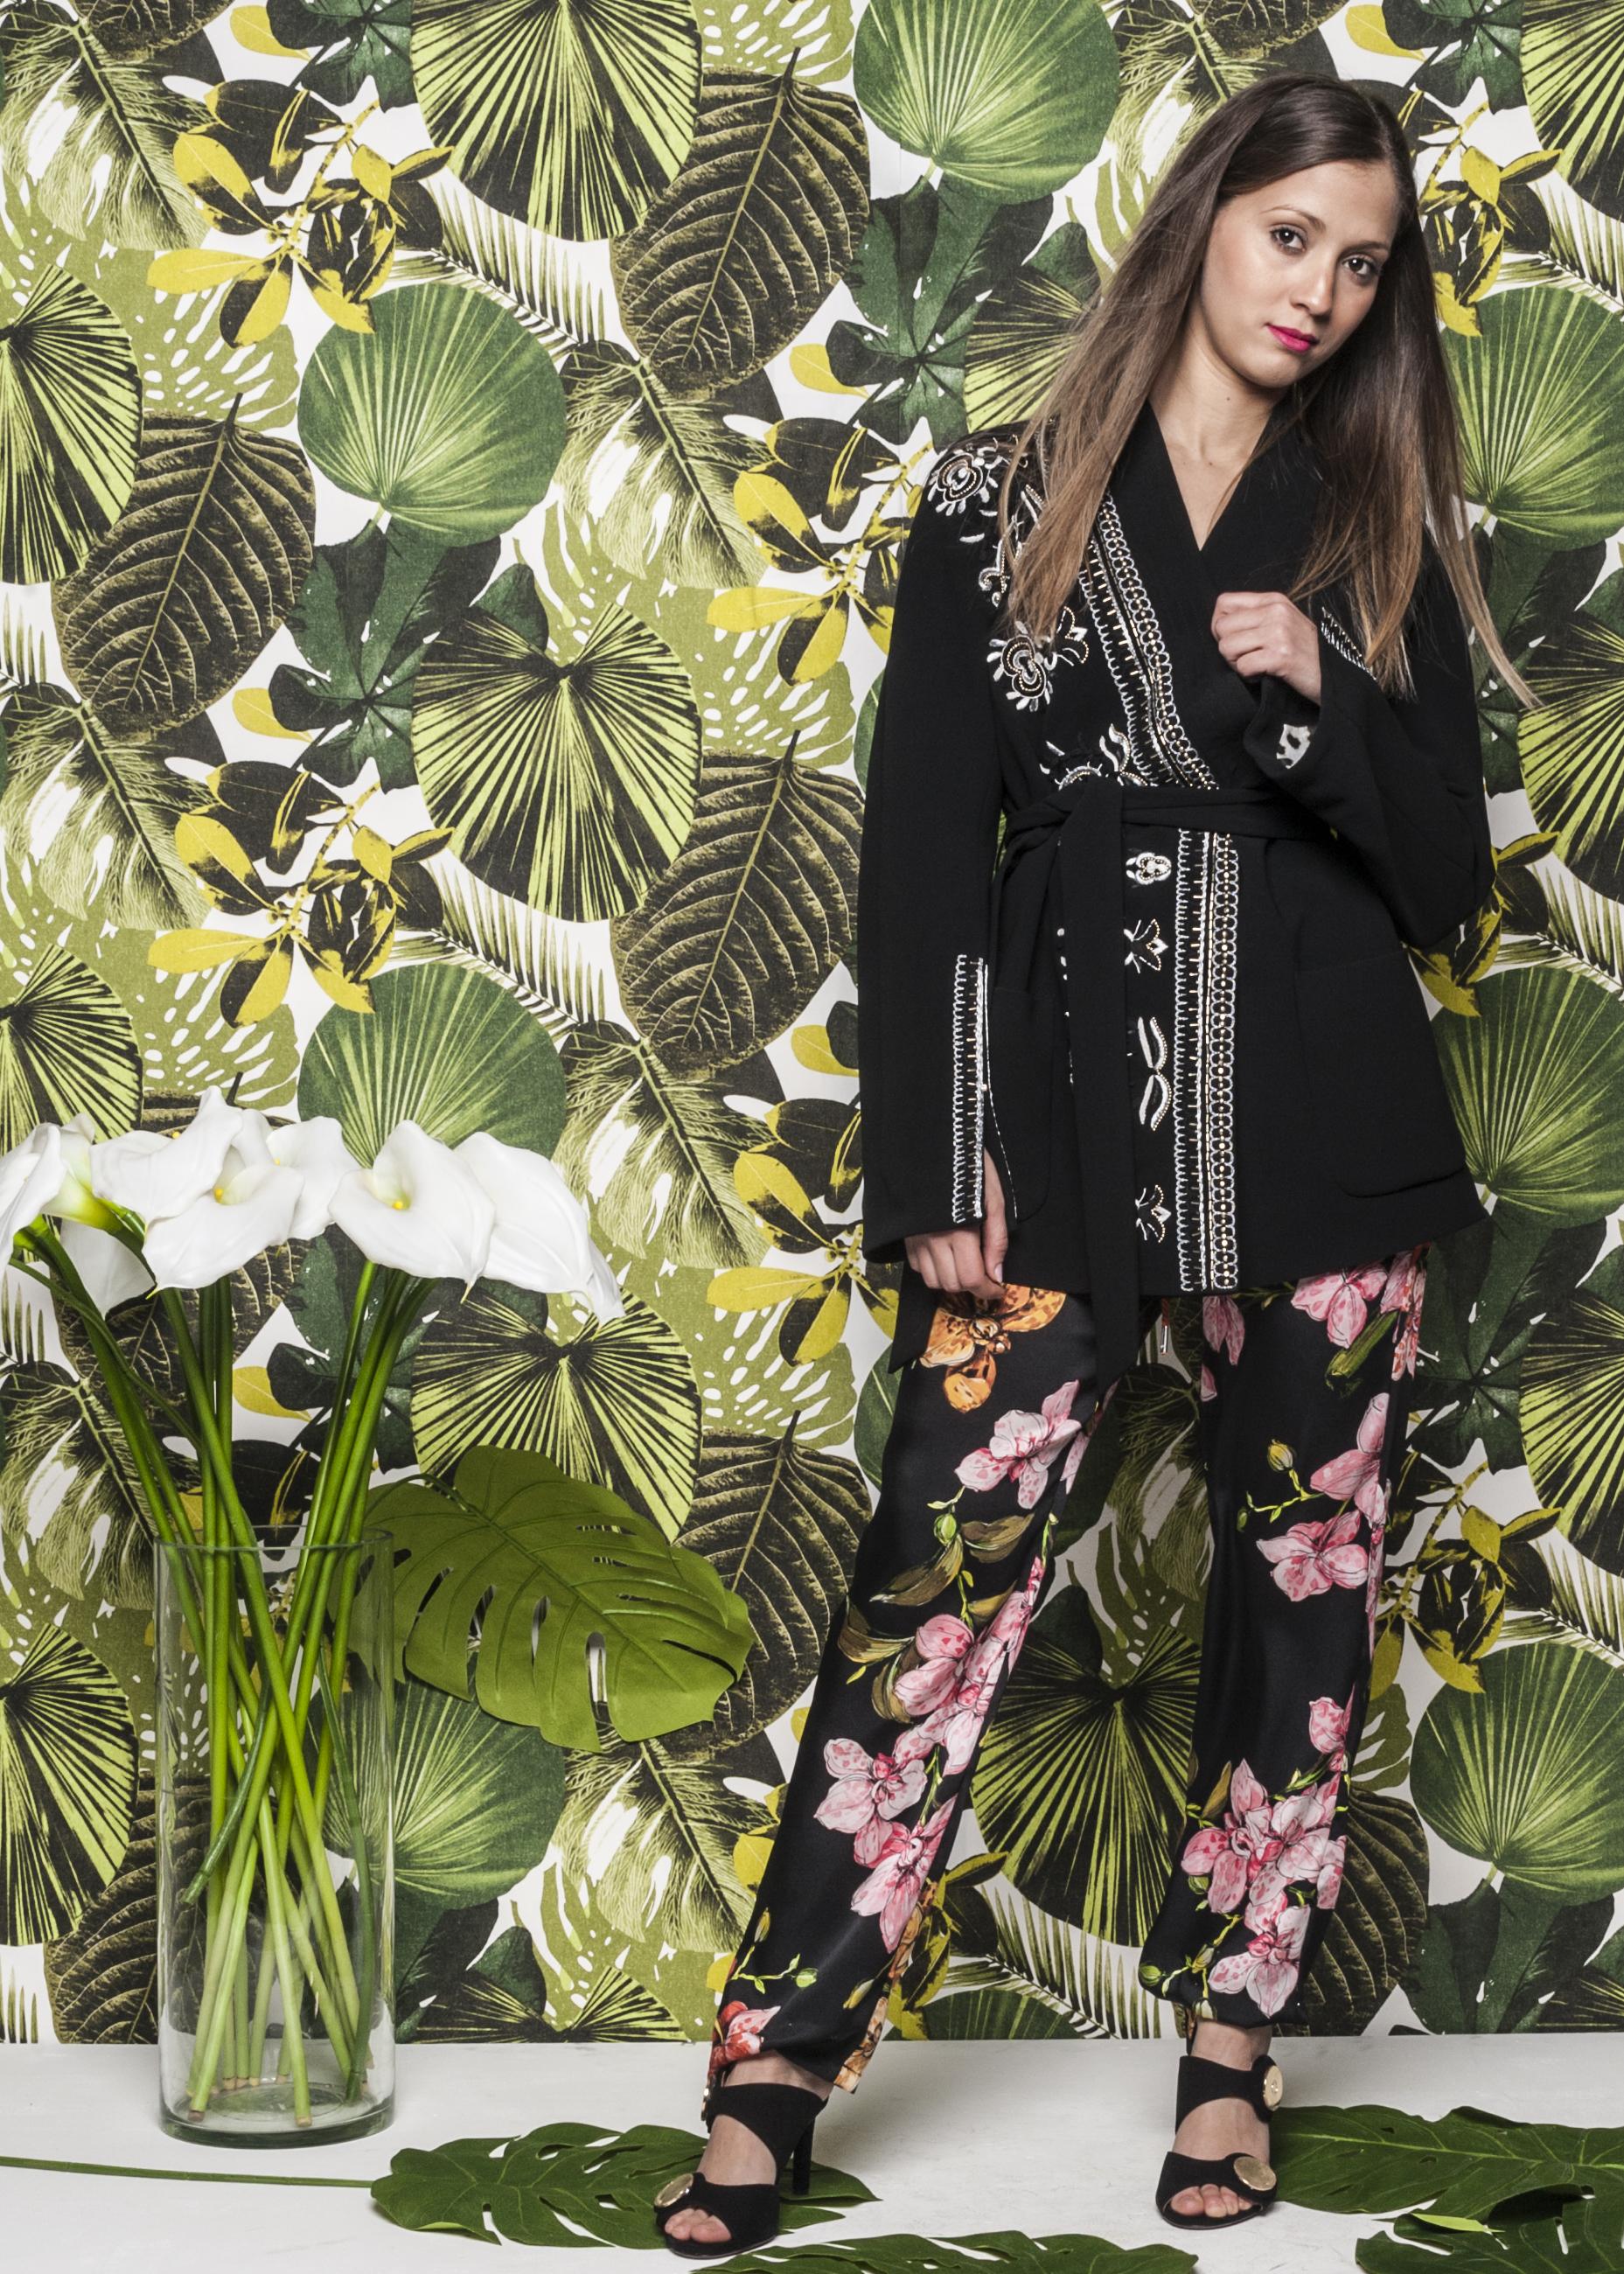 Giacca_Kimono_Bazar_Delux_€_780_Pantalone_gioging_in_seta_Pinko_€_255